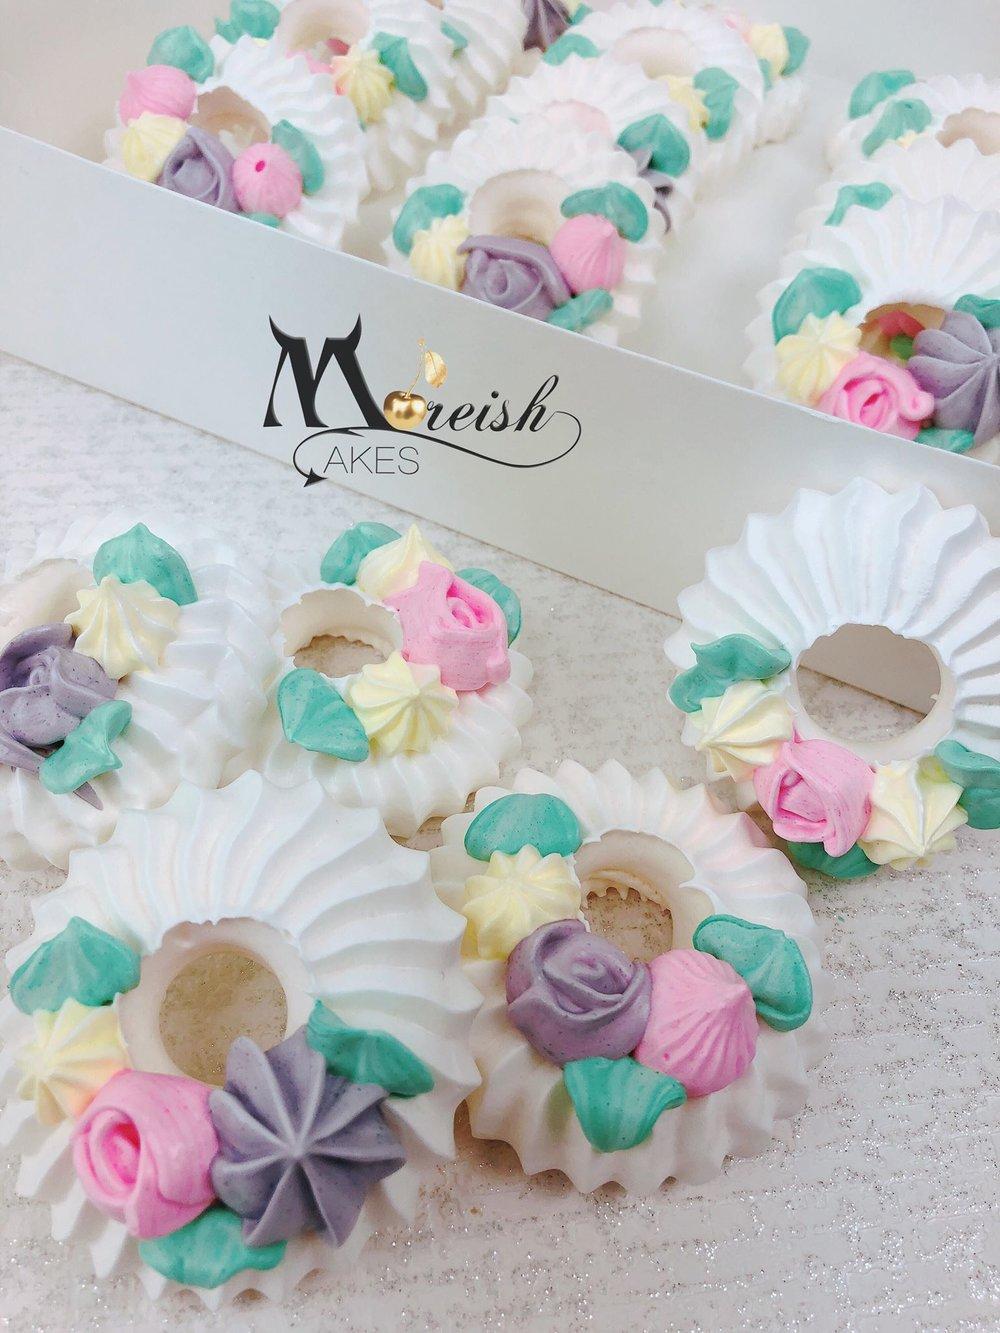 Recipes — Moreish Cakes